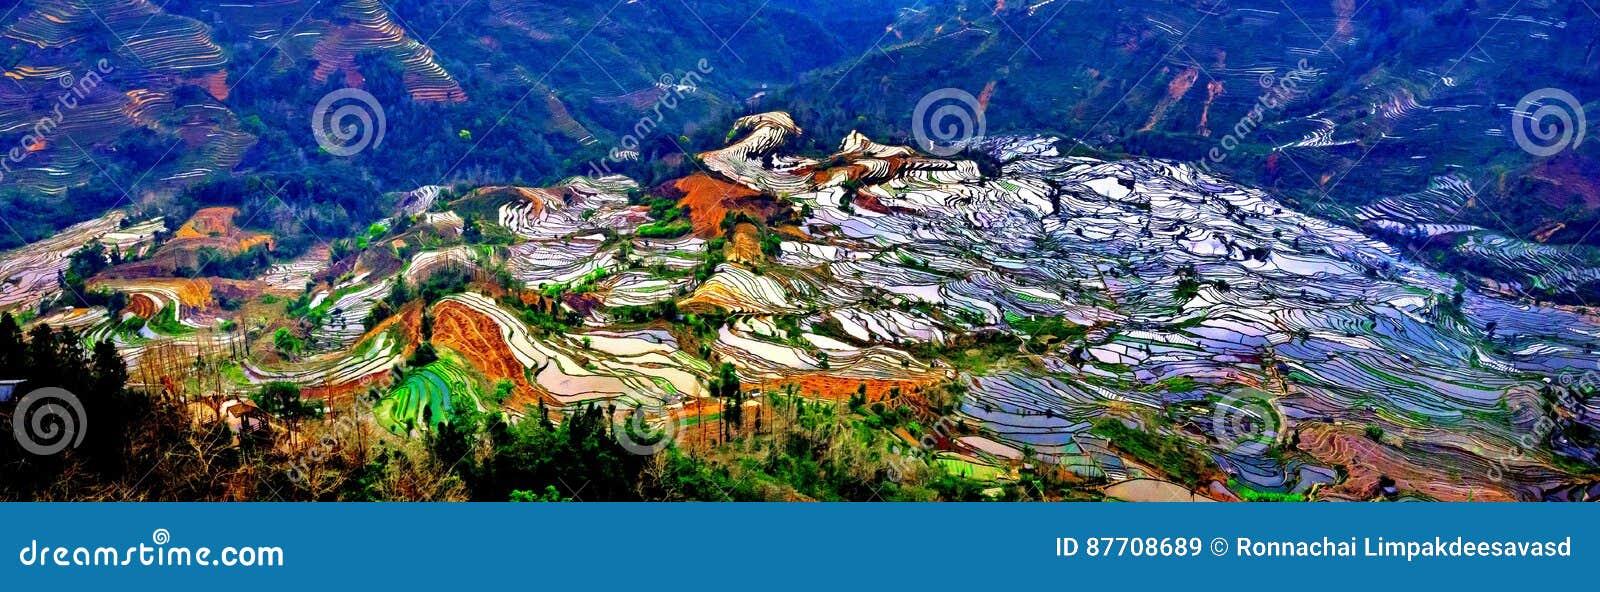 Gisements en terrasse de riz dans Laohuzui Yuanyang